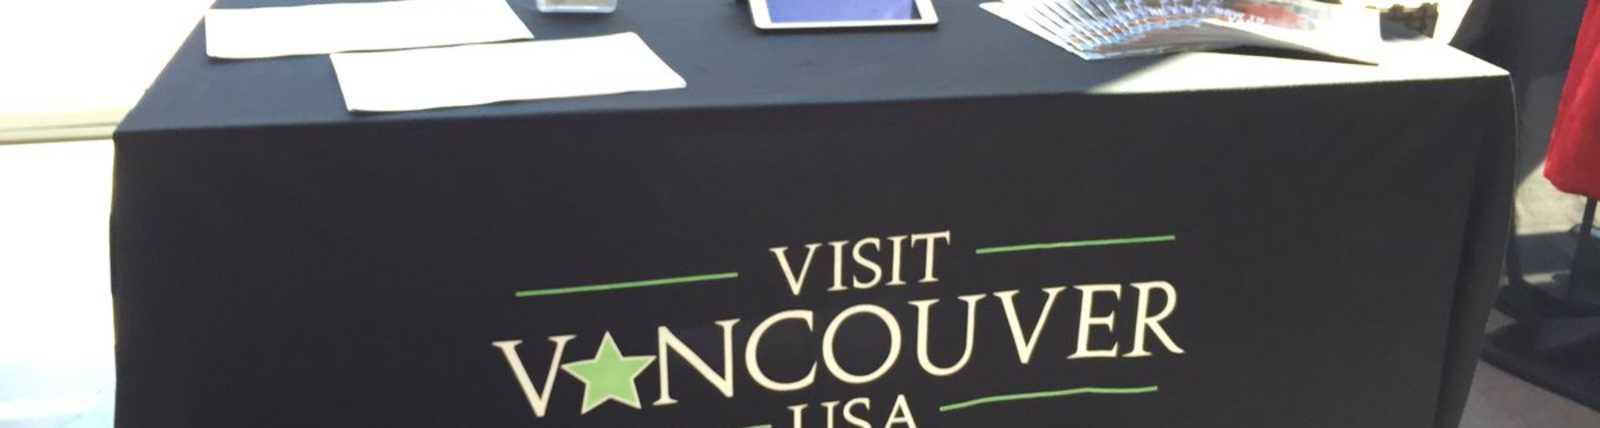 Visit Vancouver USA